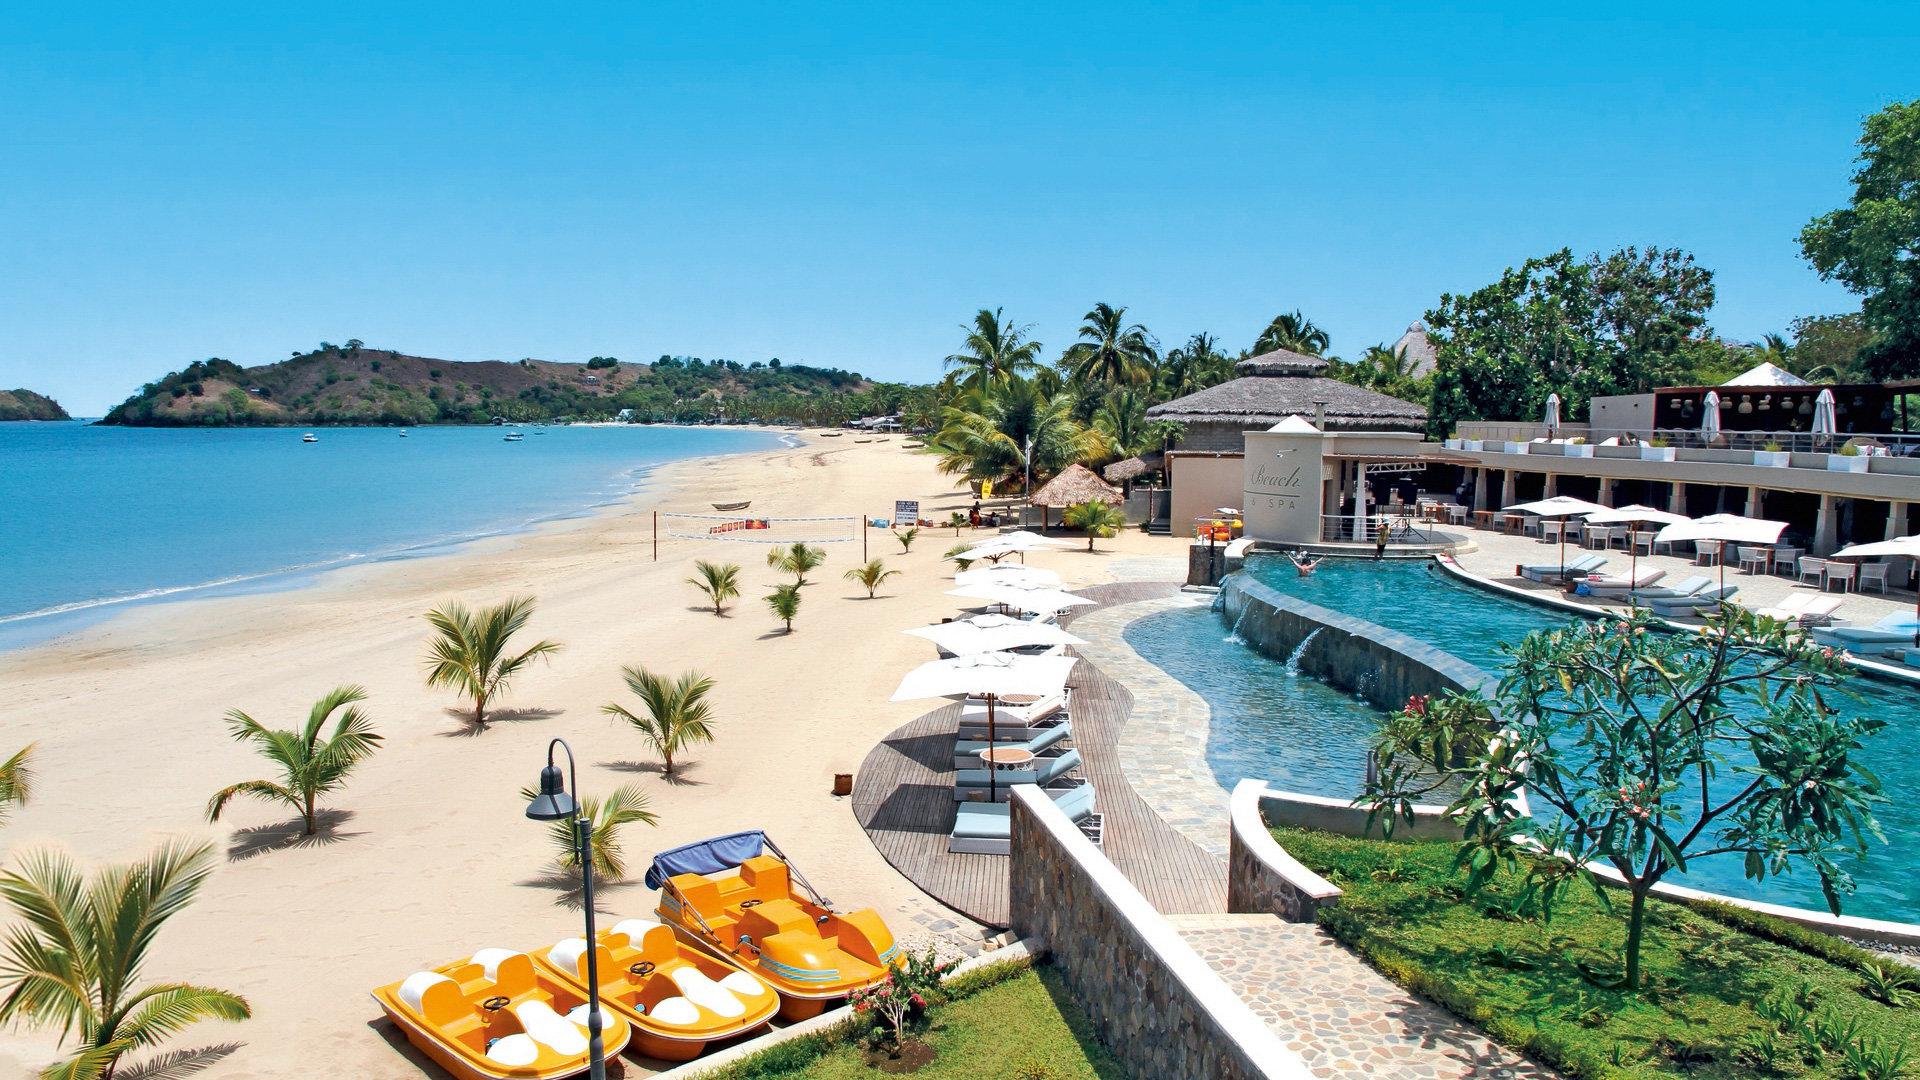 Hotel Palm Beach Resort & SPA